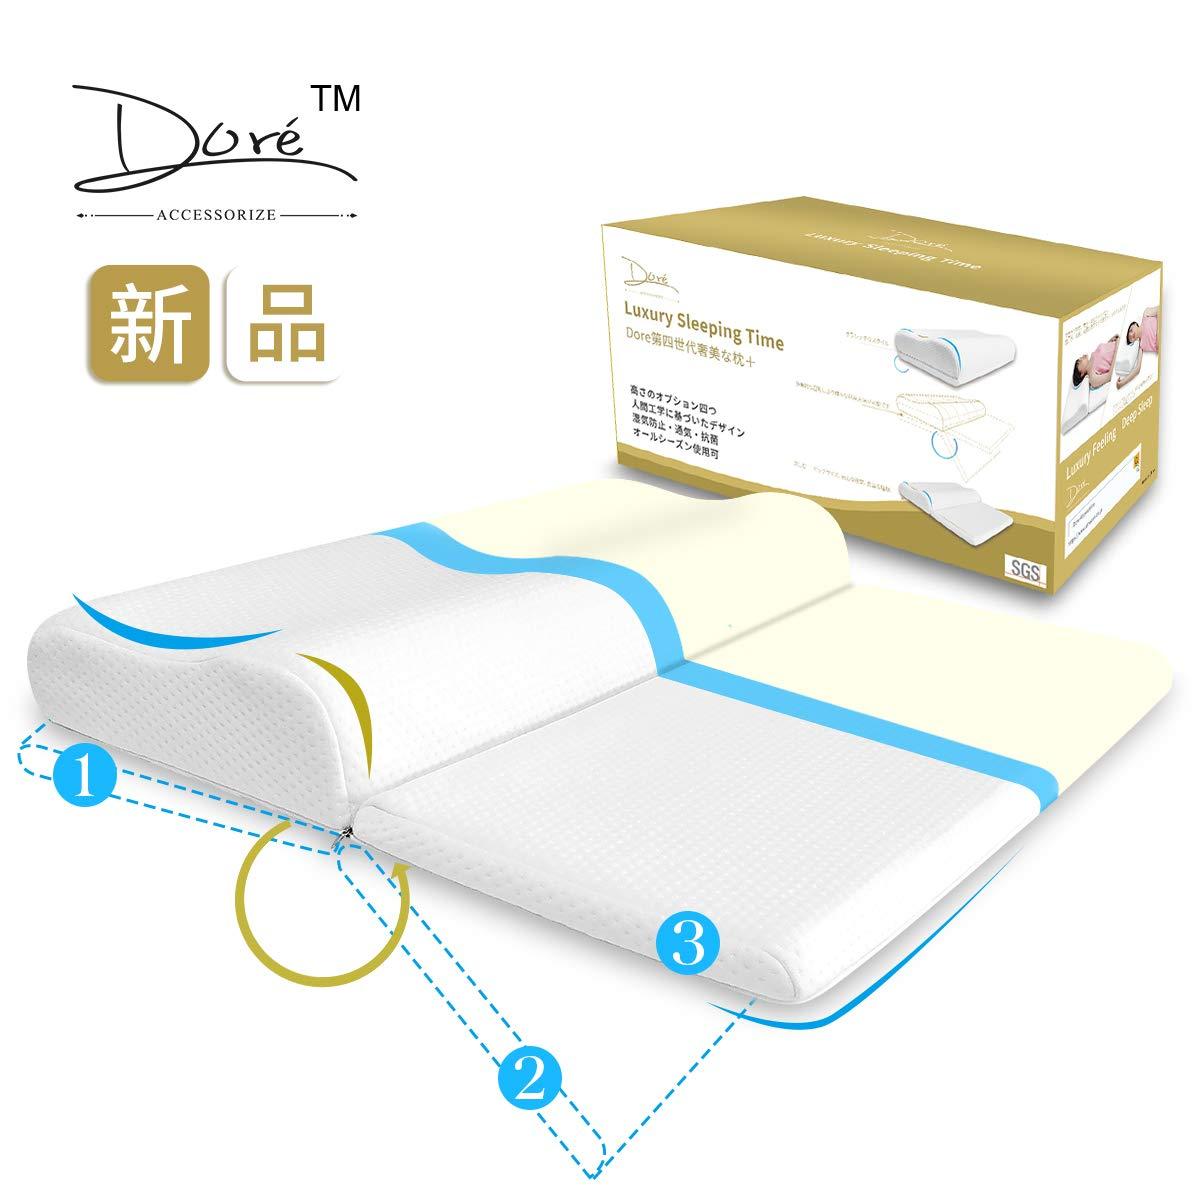 (Dore)第四世代 高級な変形枕